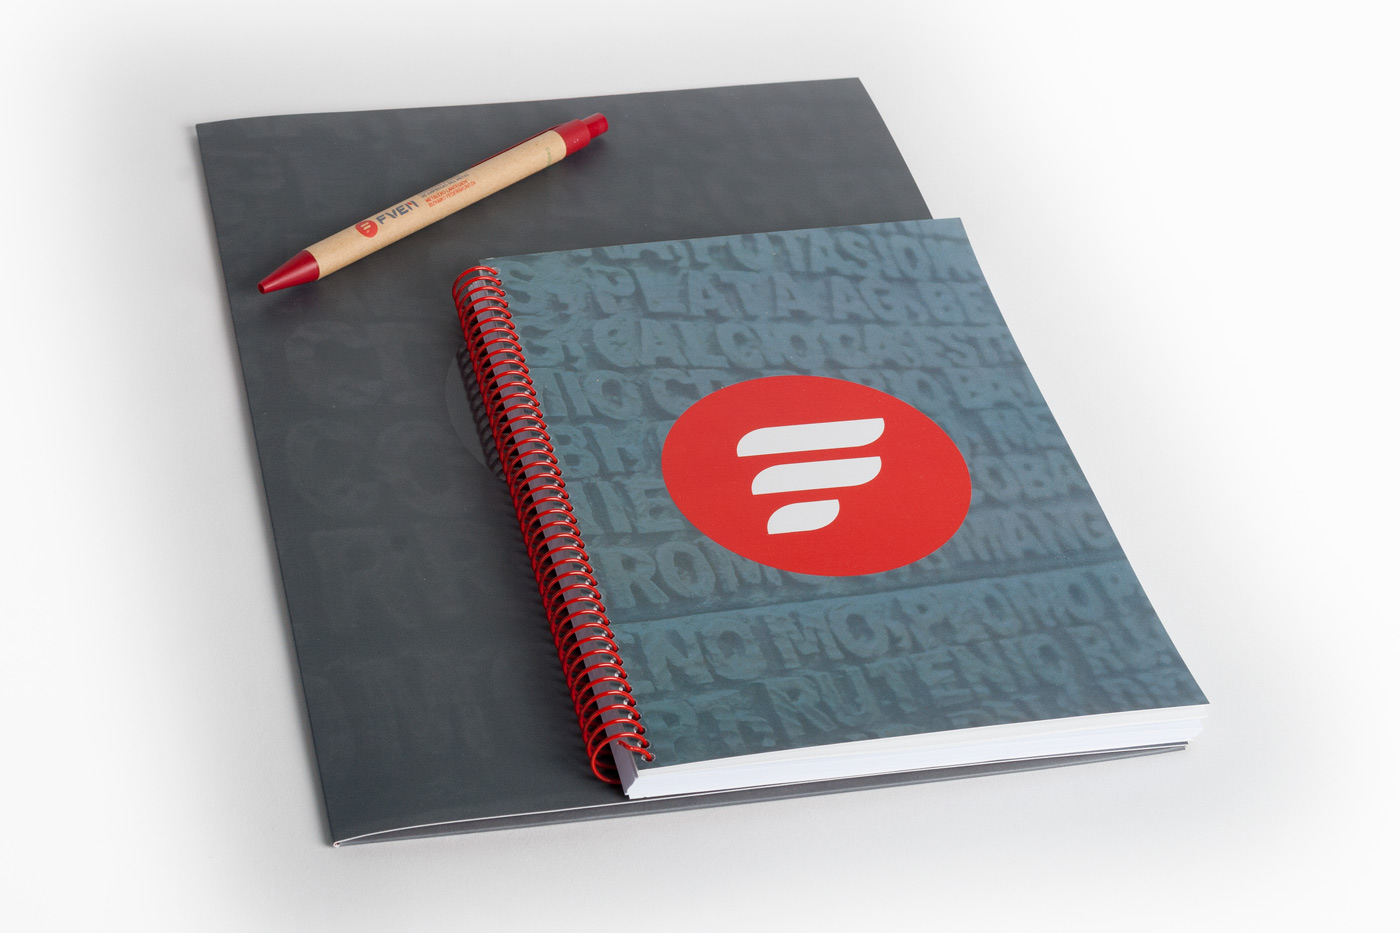 Cuaderno, Carpeta y Bolígrafo FVEM